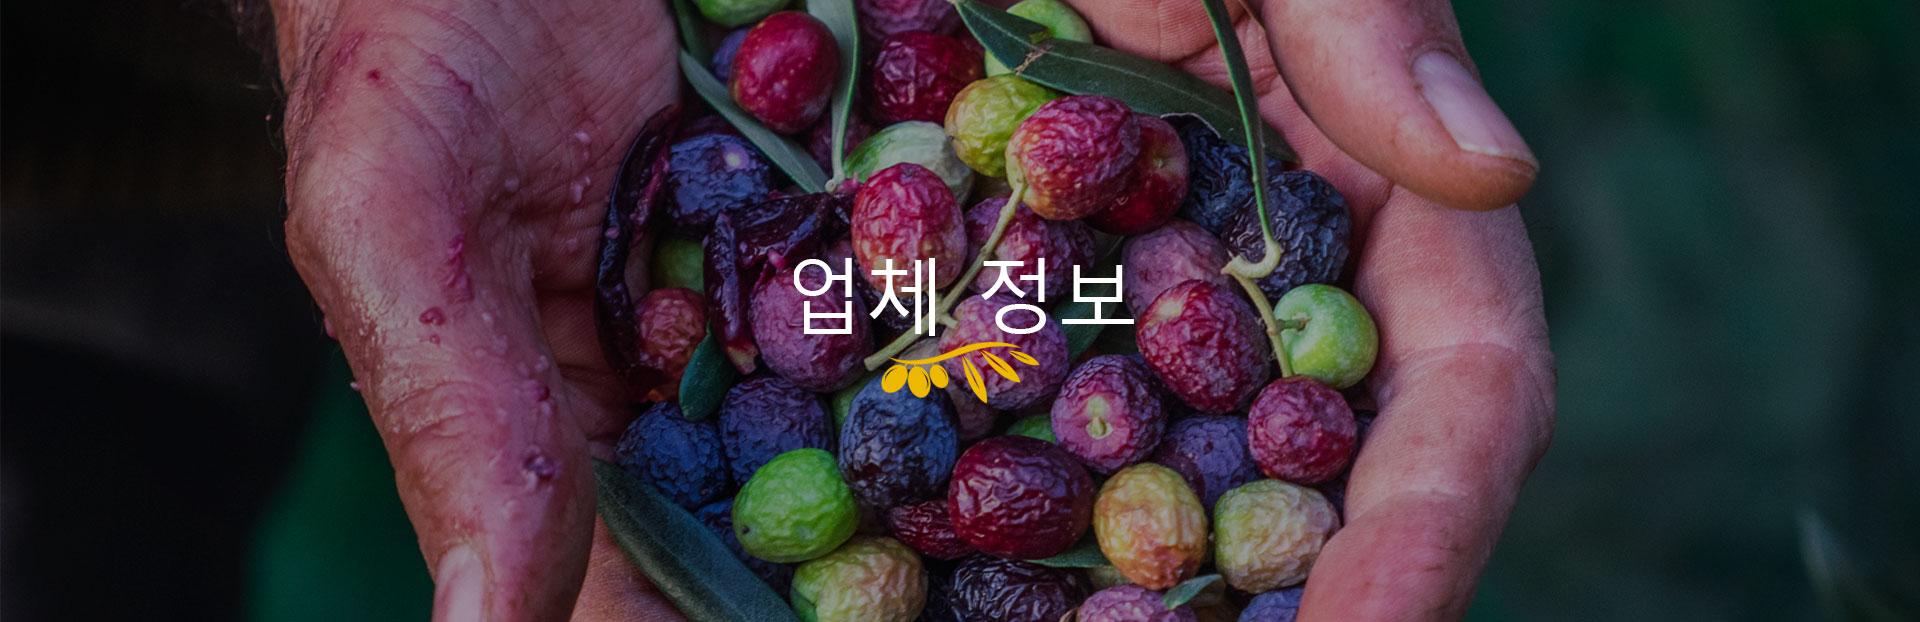 AceitesUnicos_slider_quienessomos_koreano